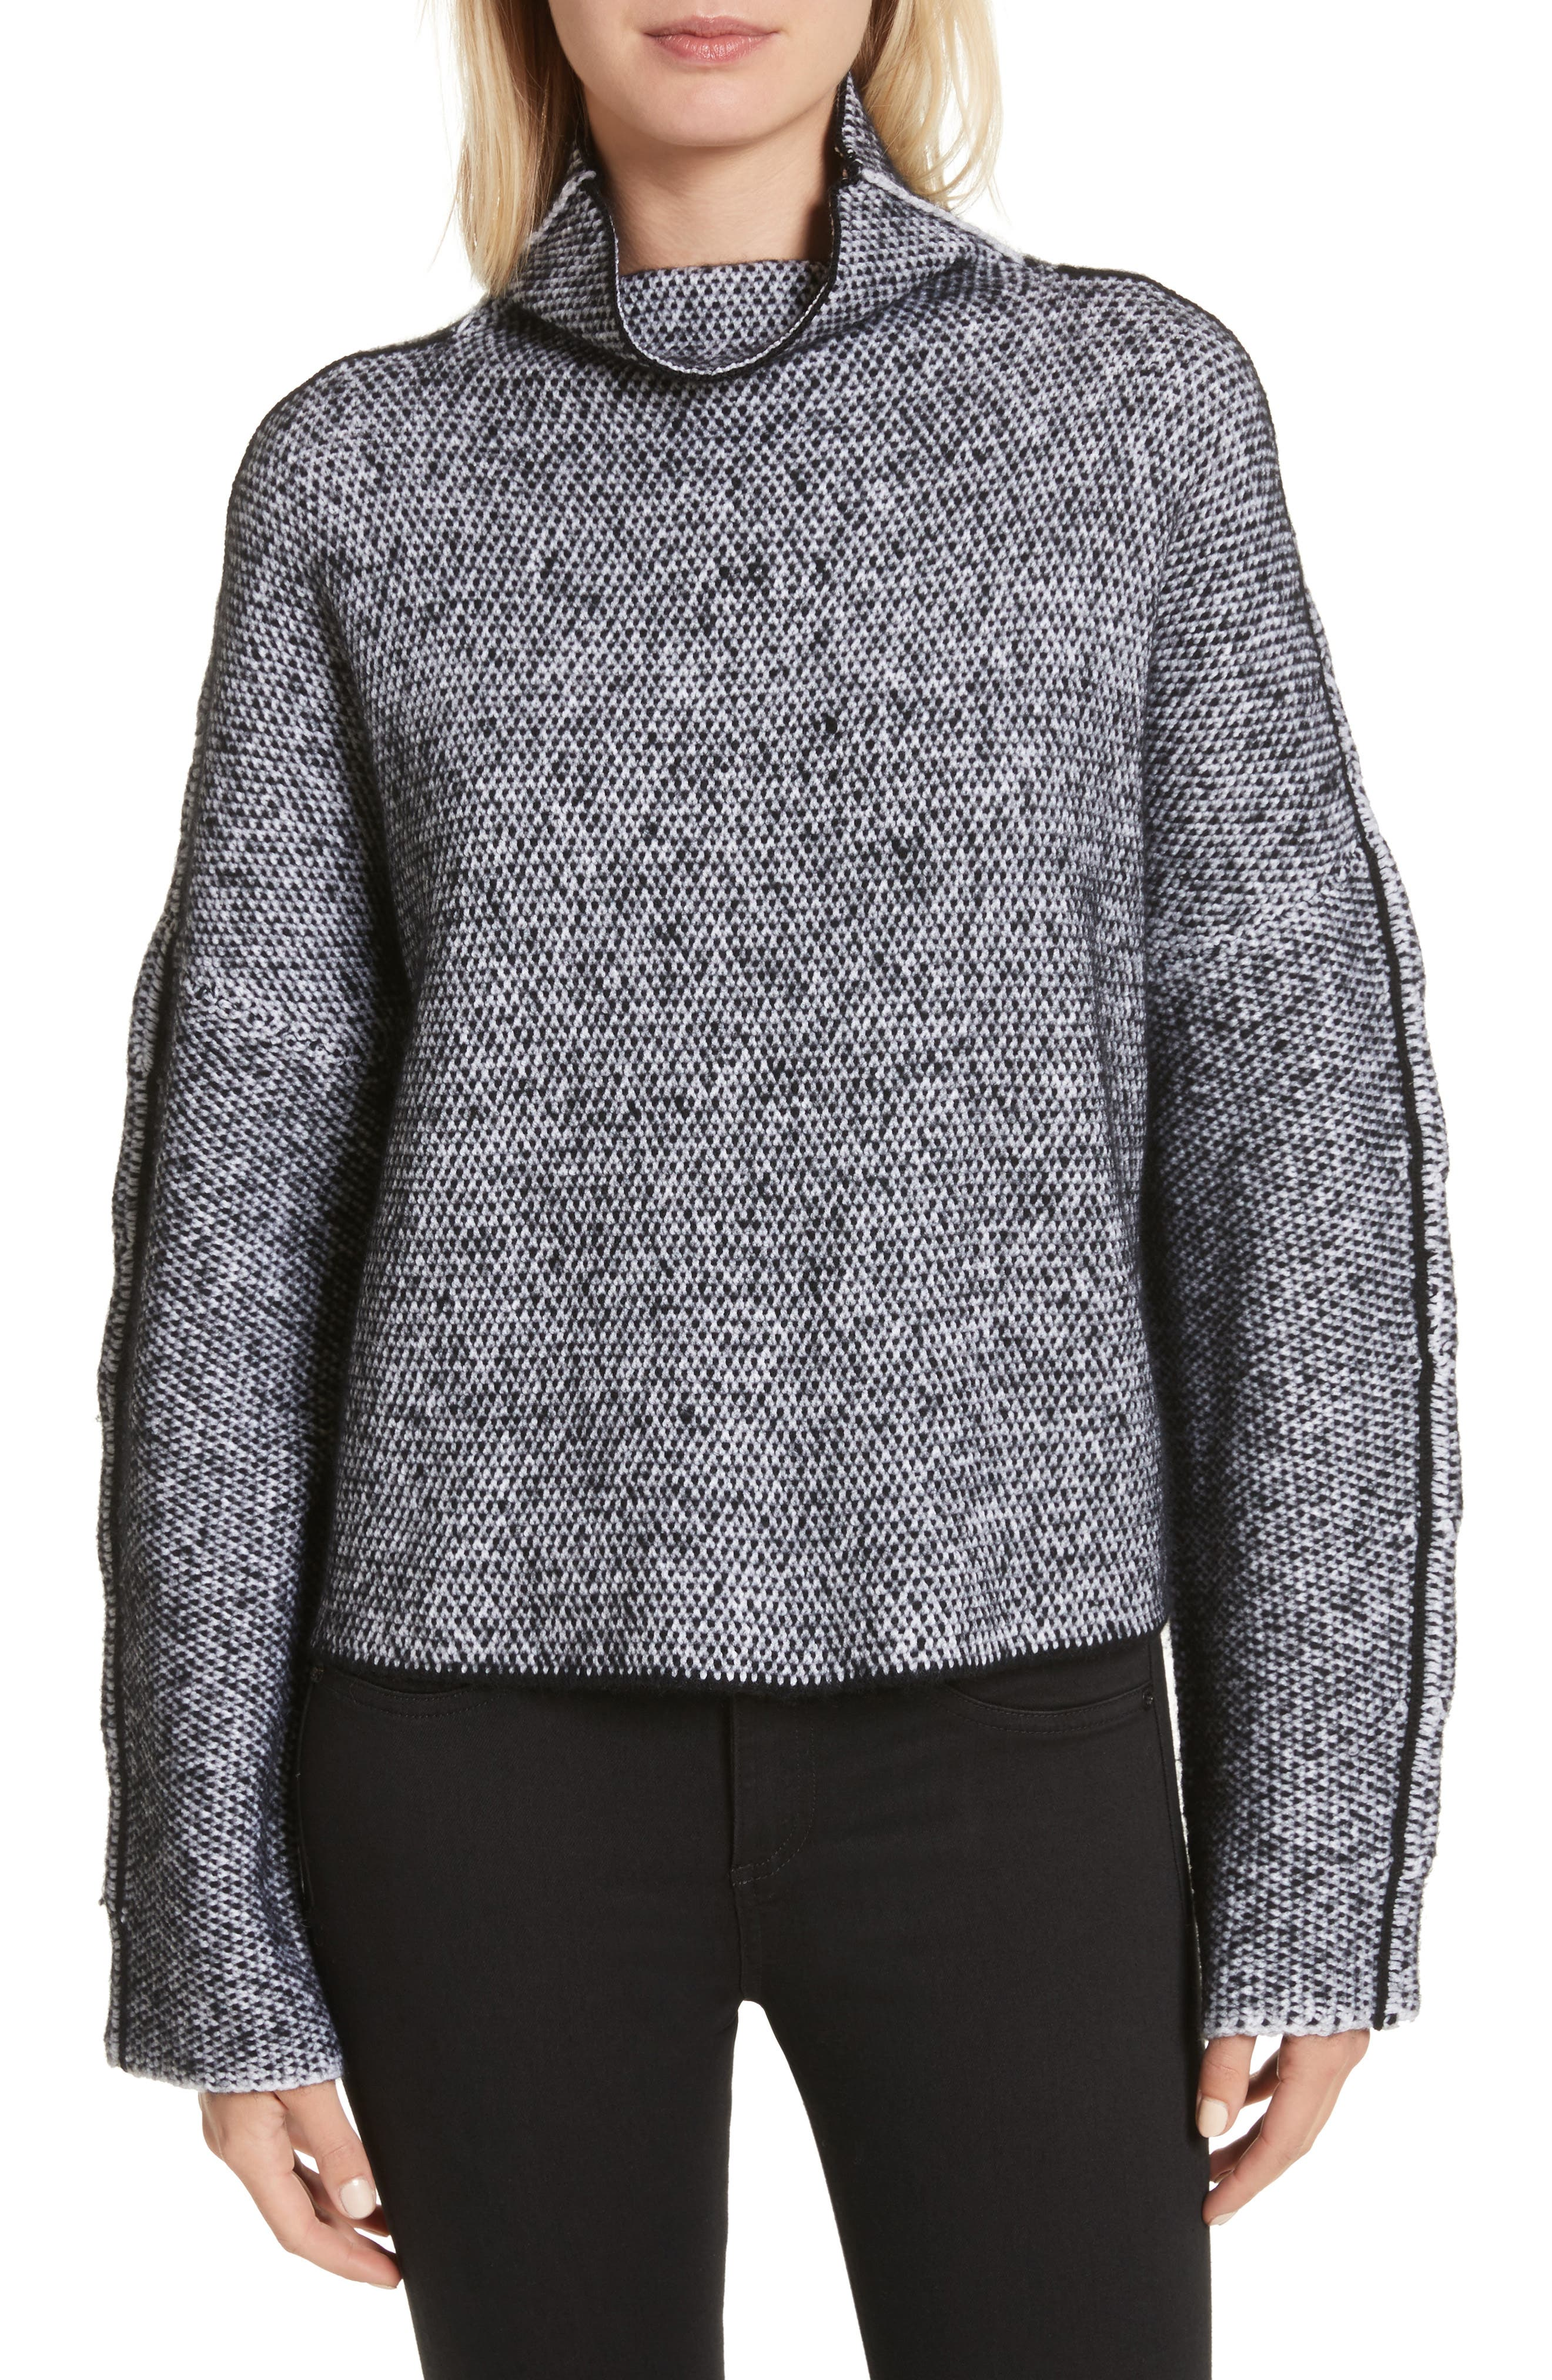 Robin Merino Wool Blend Sweater,                             Main thumbnail 1, color,                             001